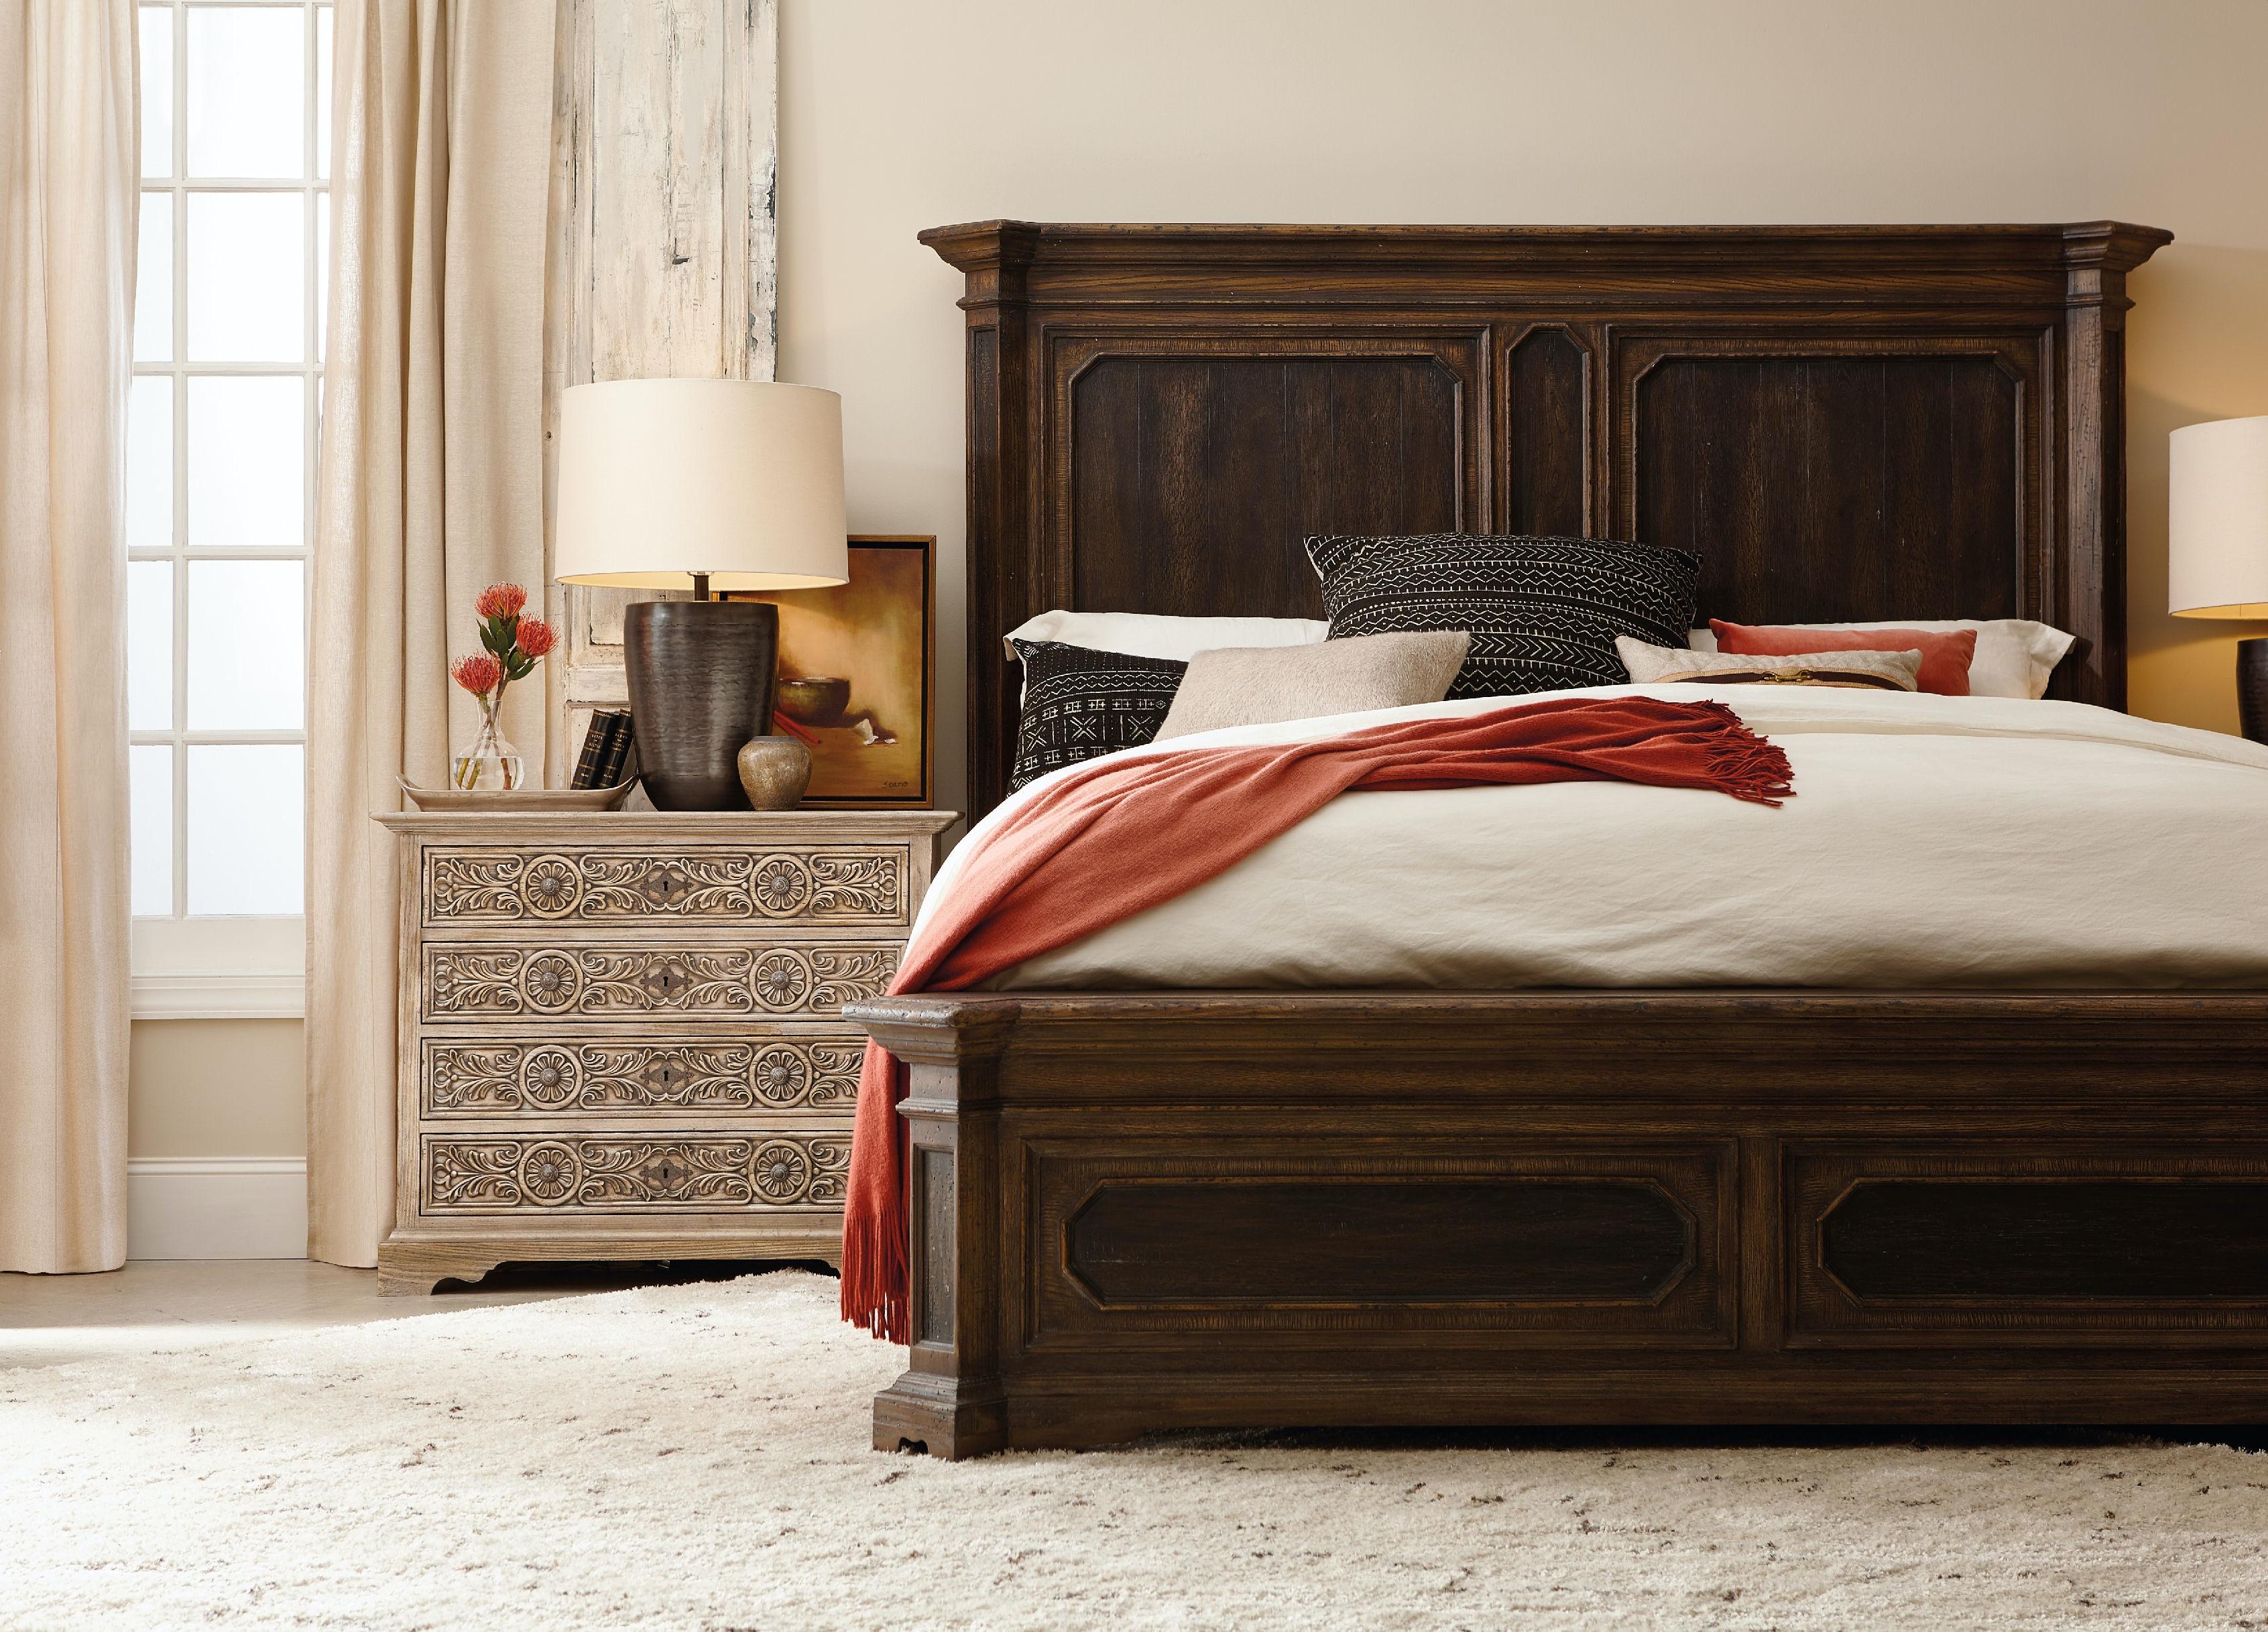 Hooker Furniture Woodcreek Queen Mansion Bed 5960 90250 MULTI